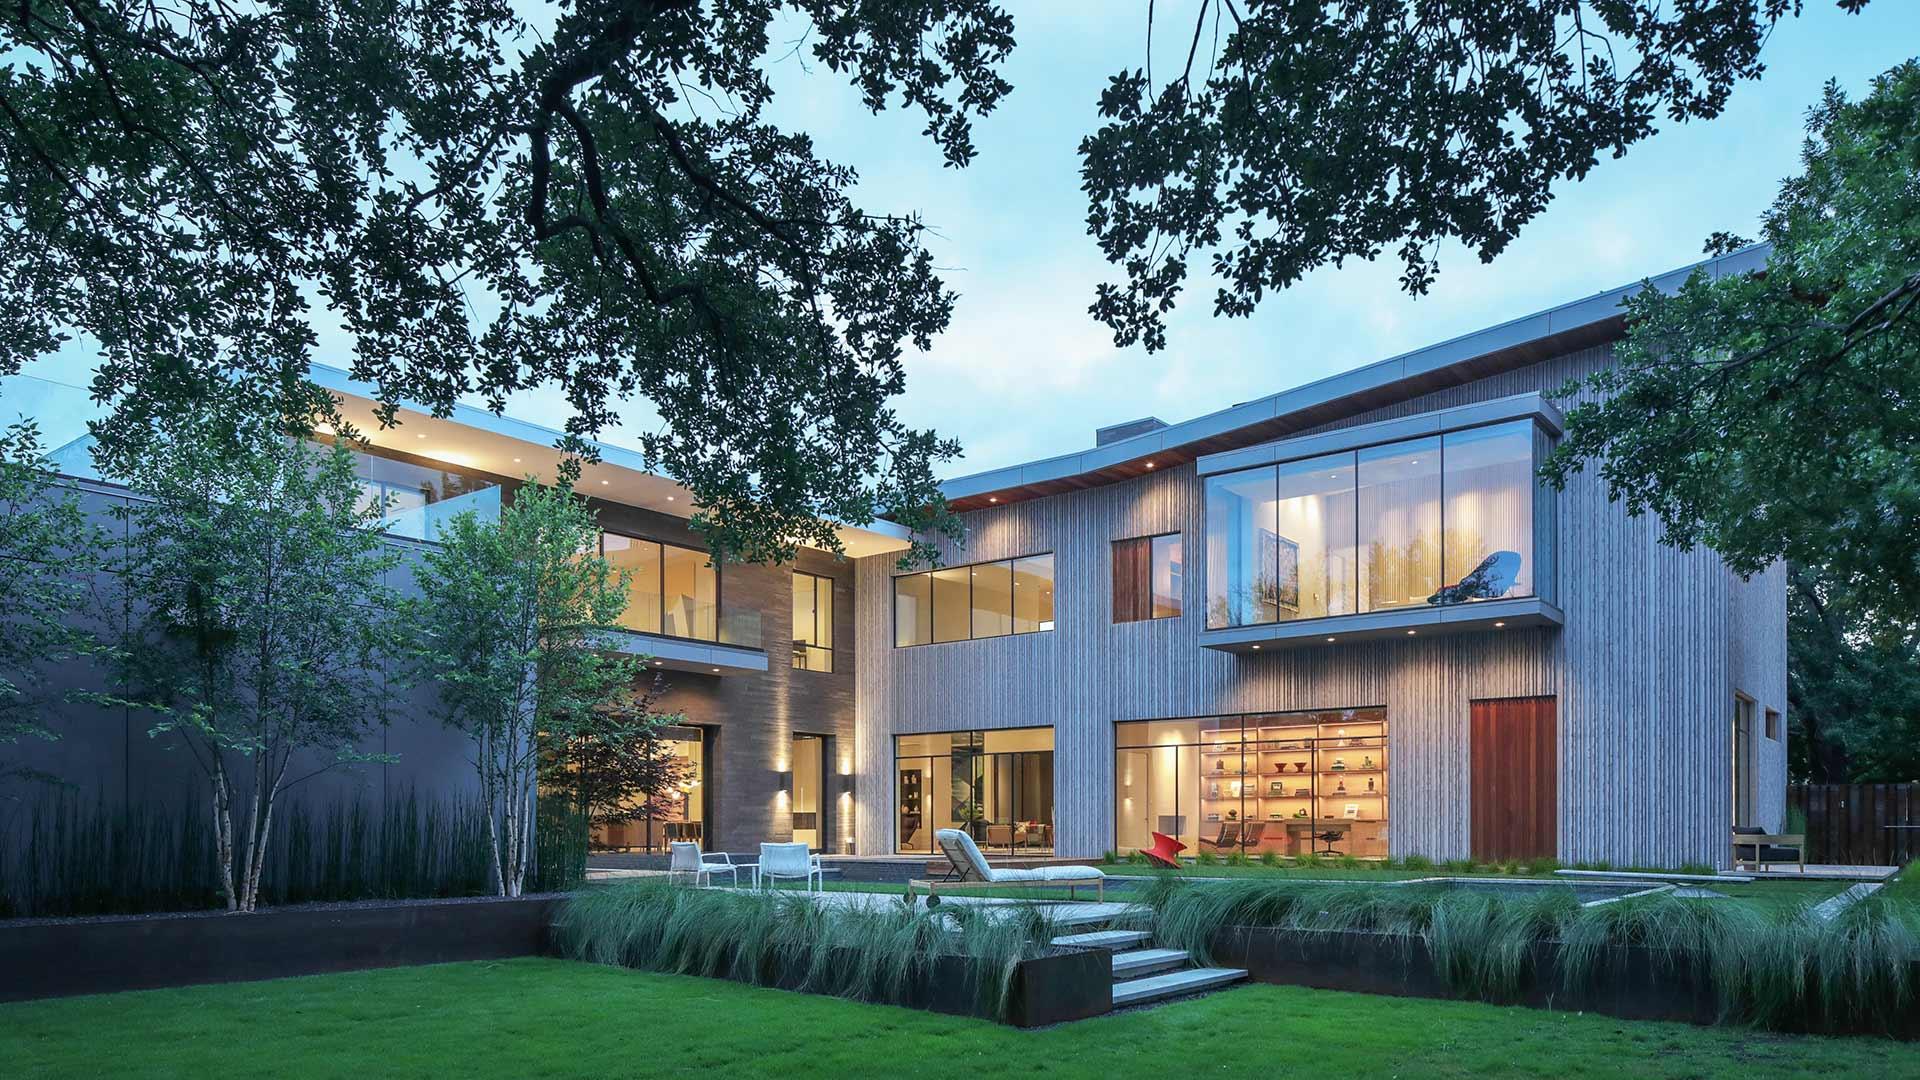 Beautiful house with glass windows